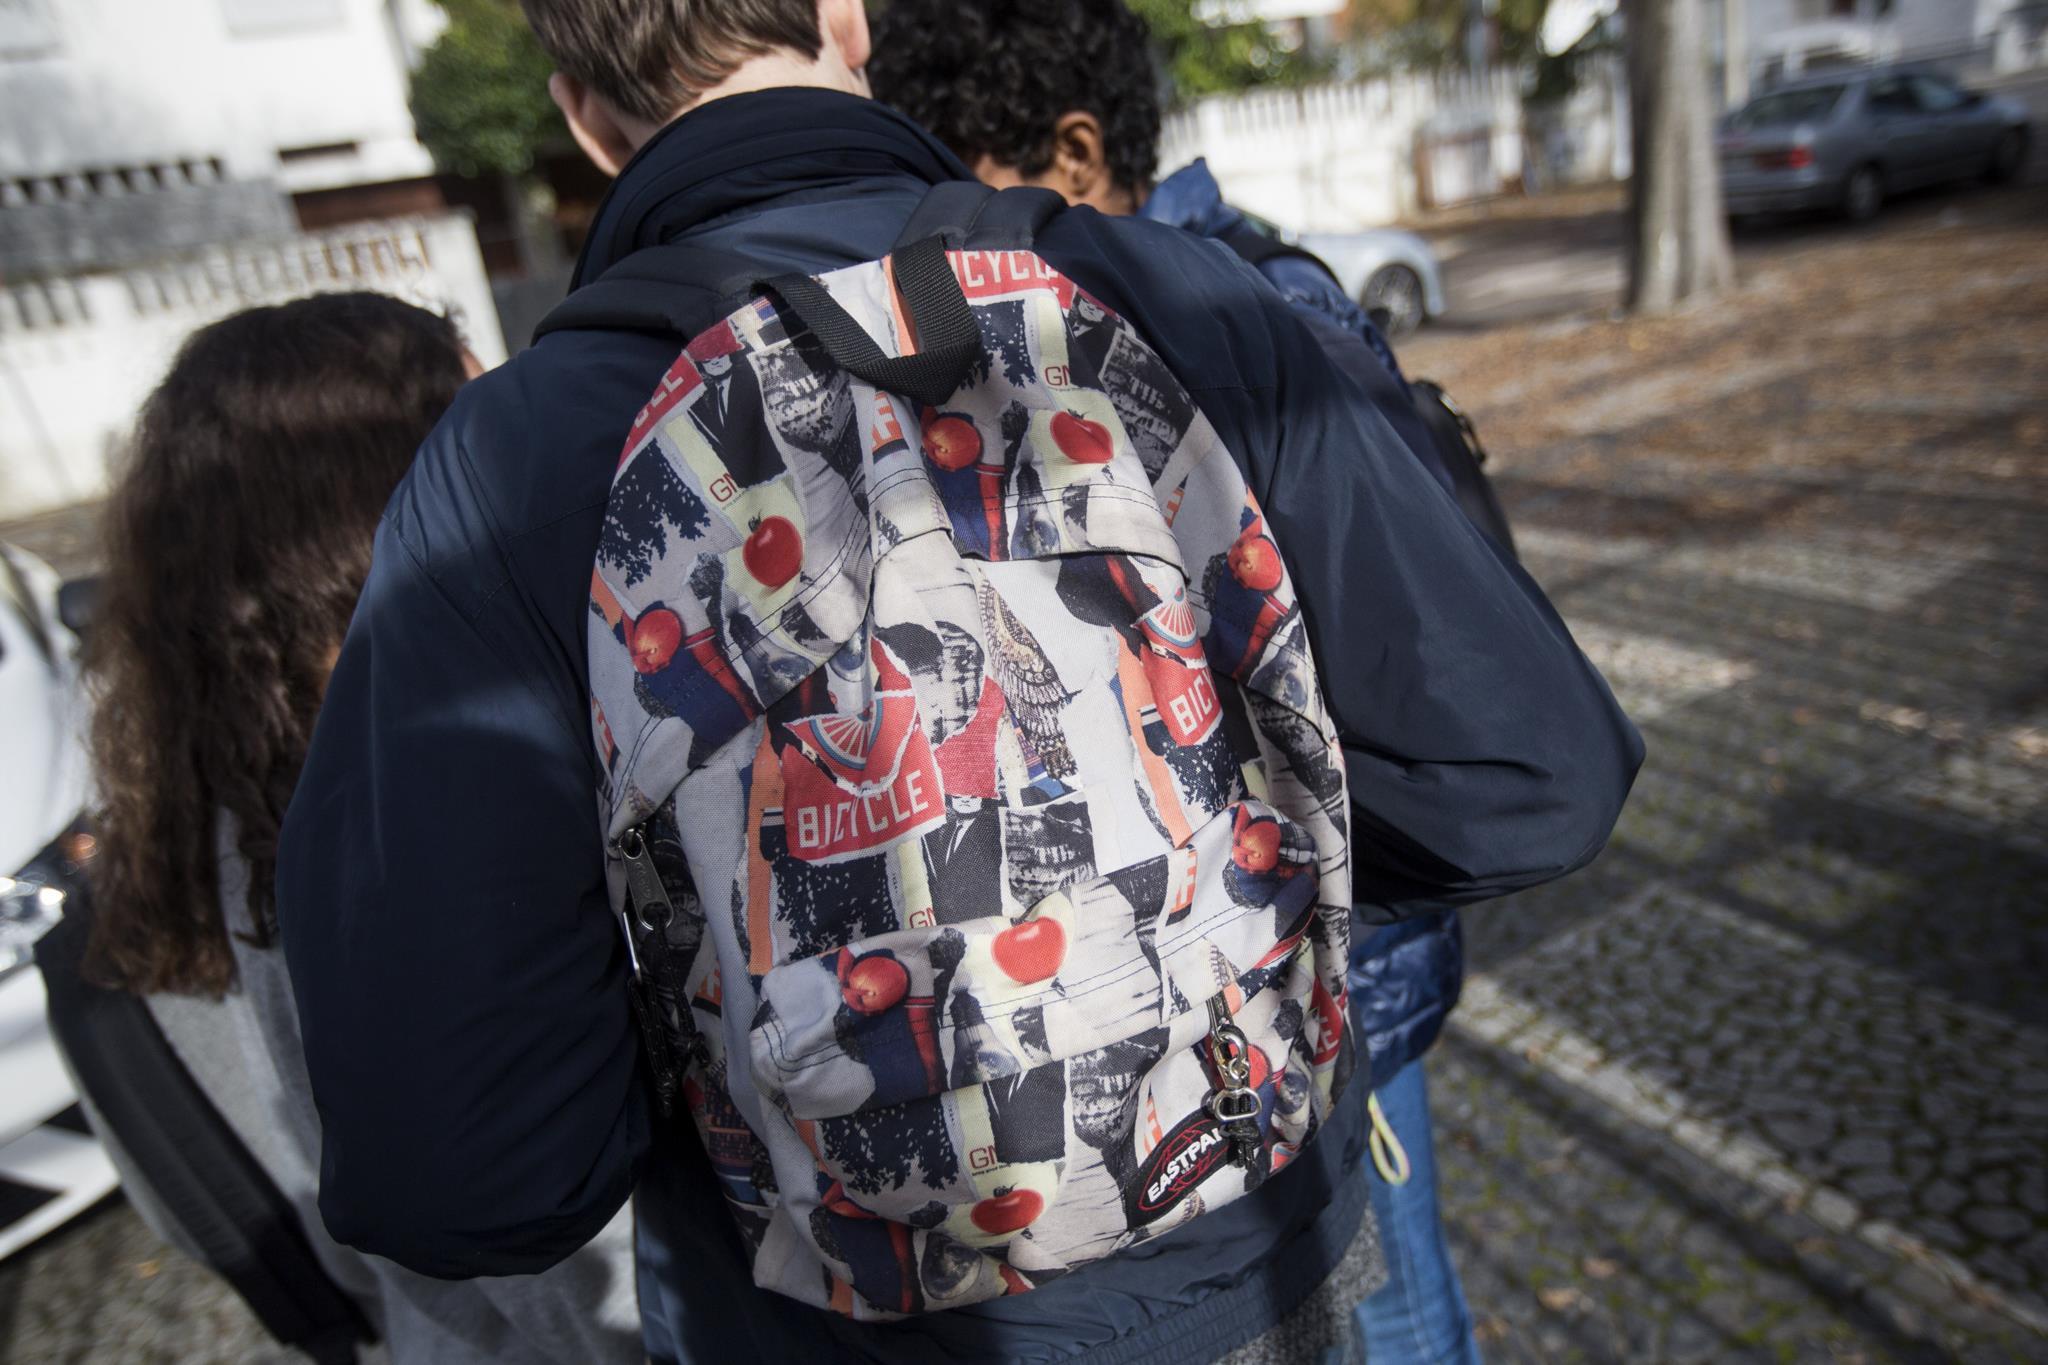 PÚBLICO - Guilherme Valente